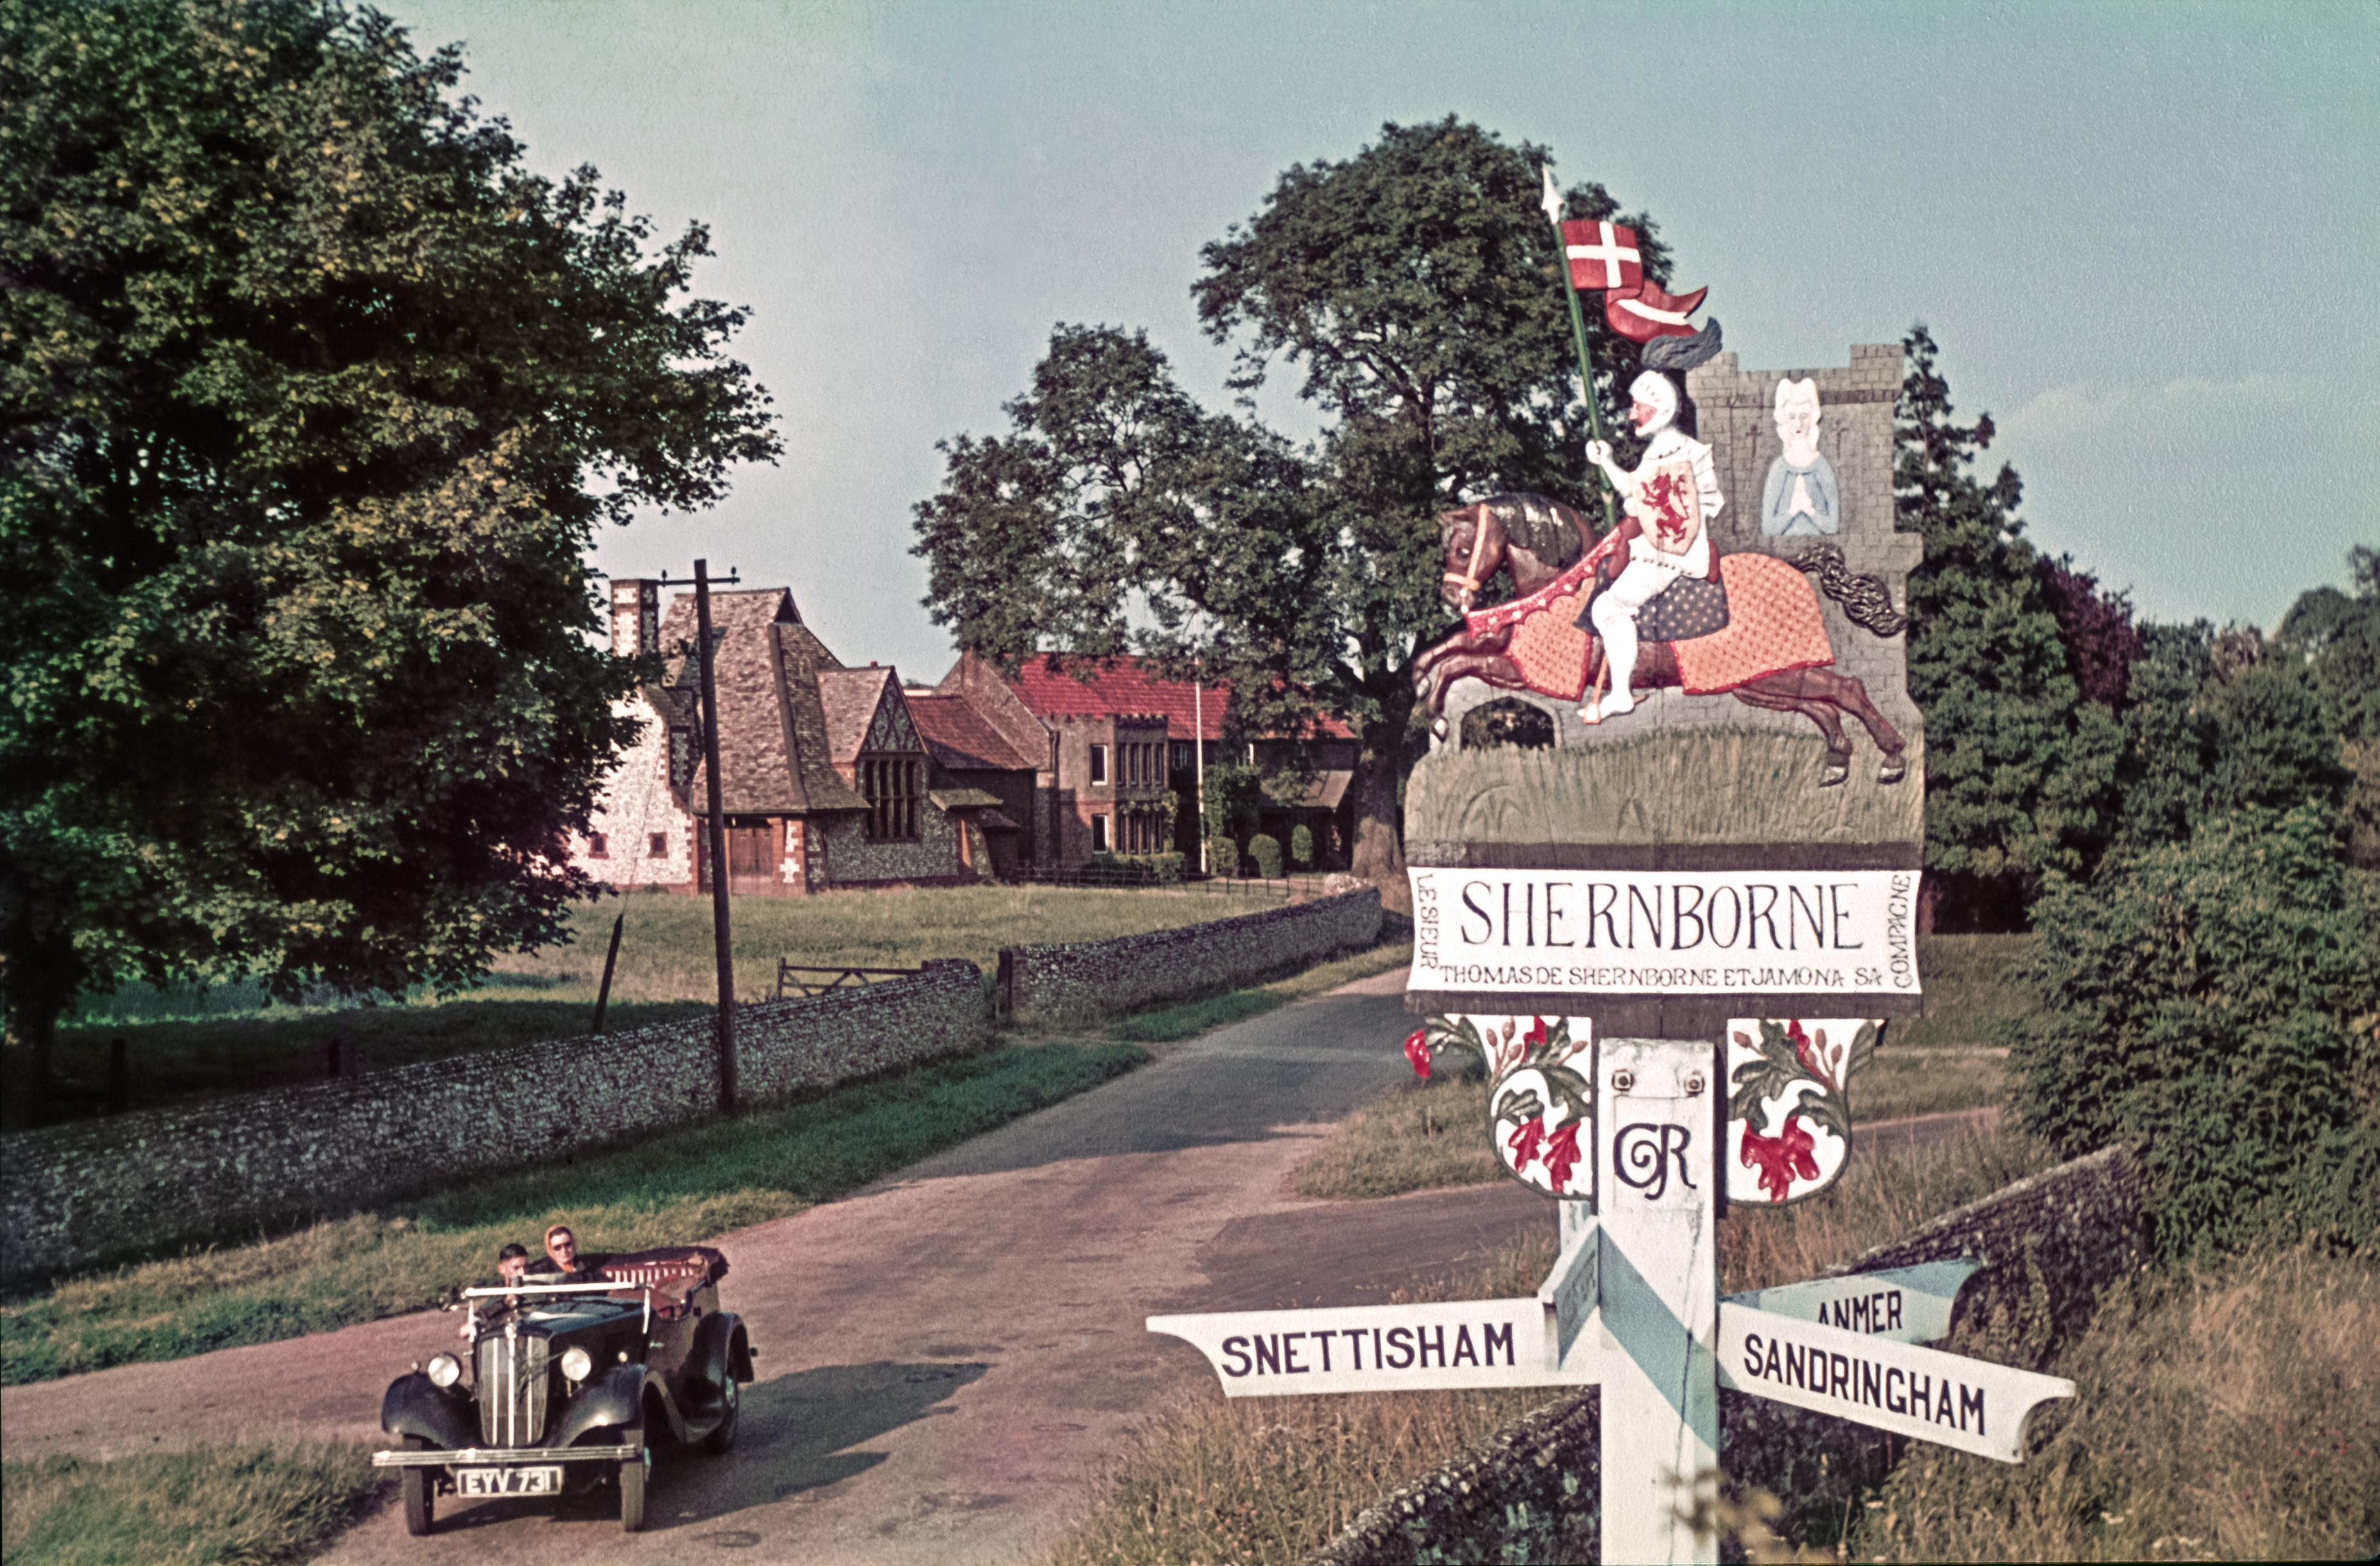 2014-05-15-Shernborne.jpg